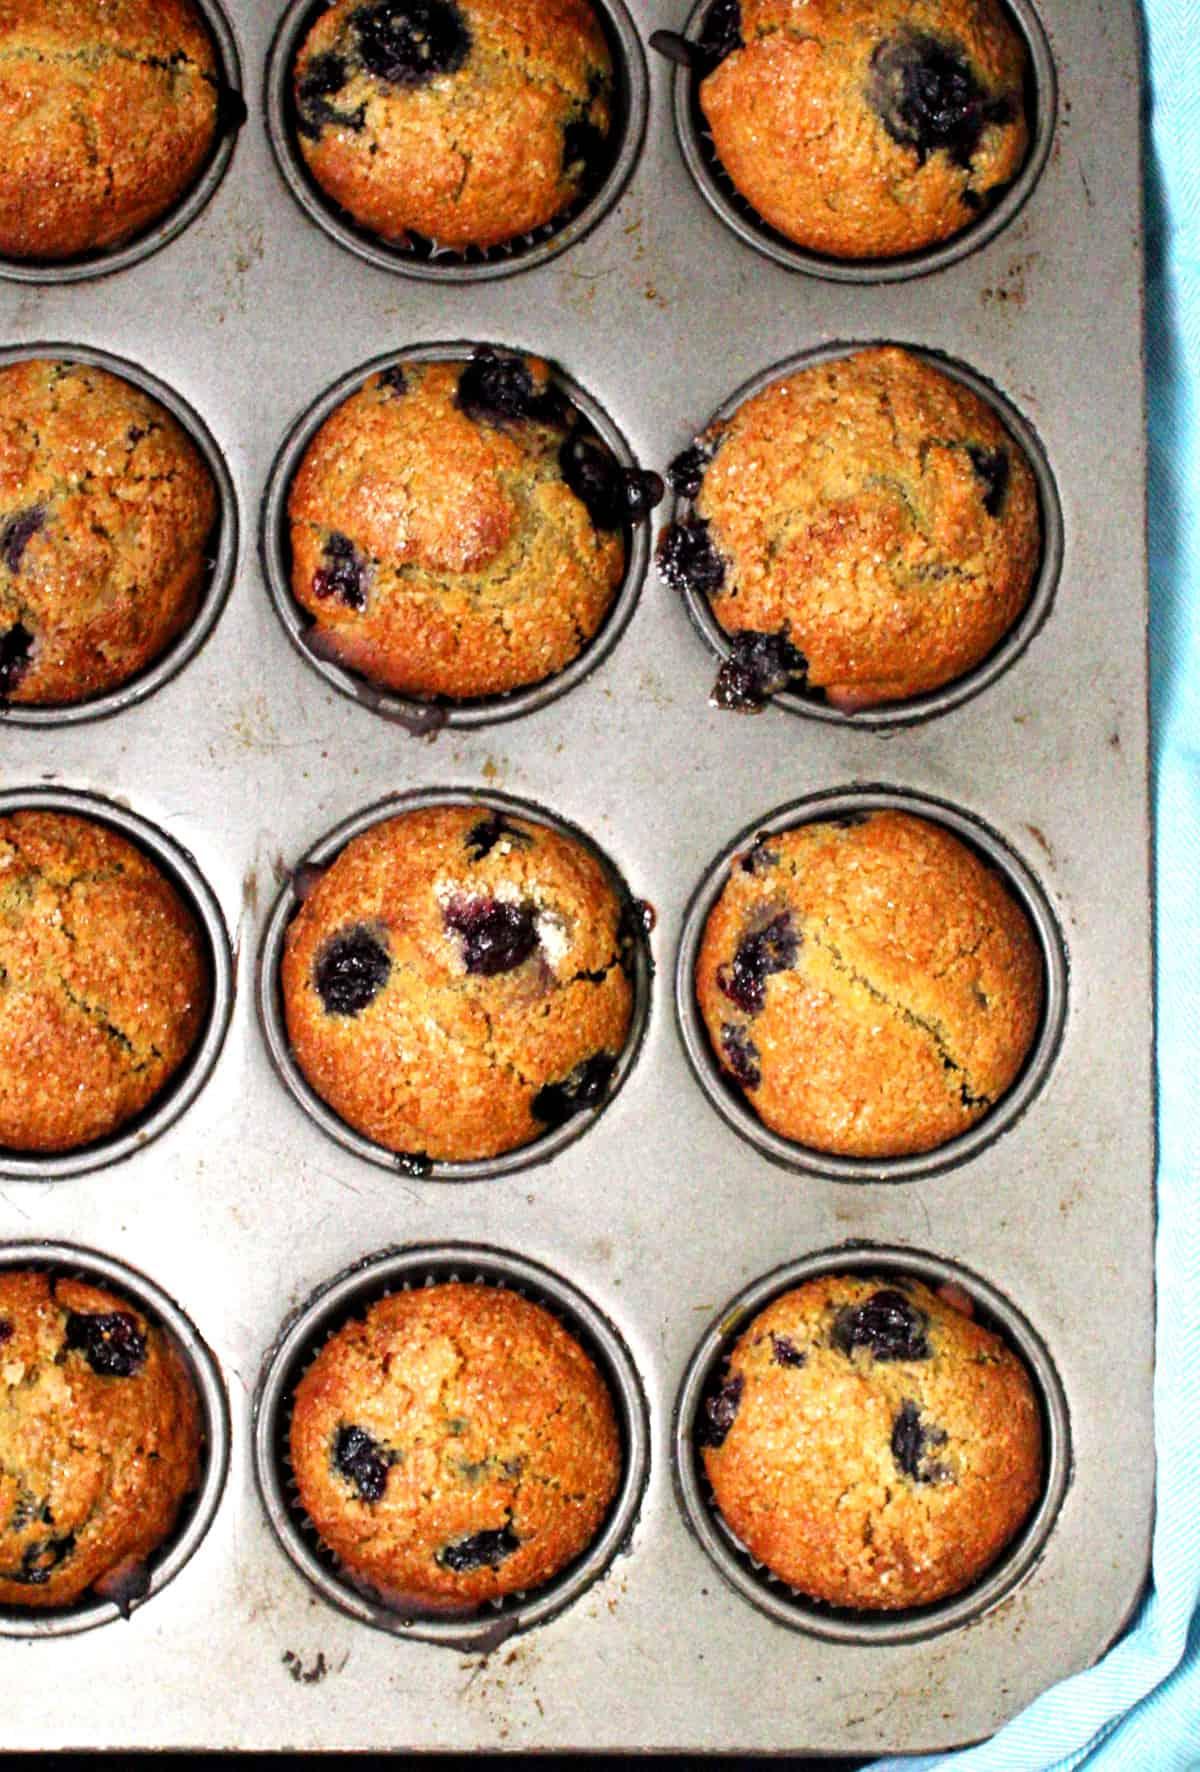 Overhead shot of a muffin pan with golden vegan sourdough blueberry muffins.